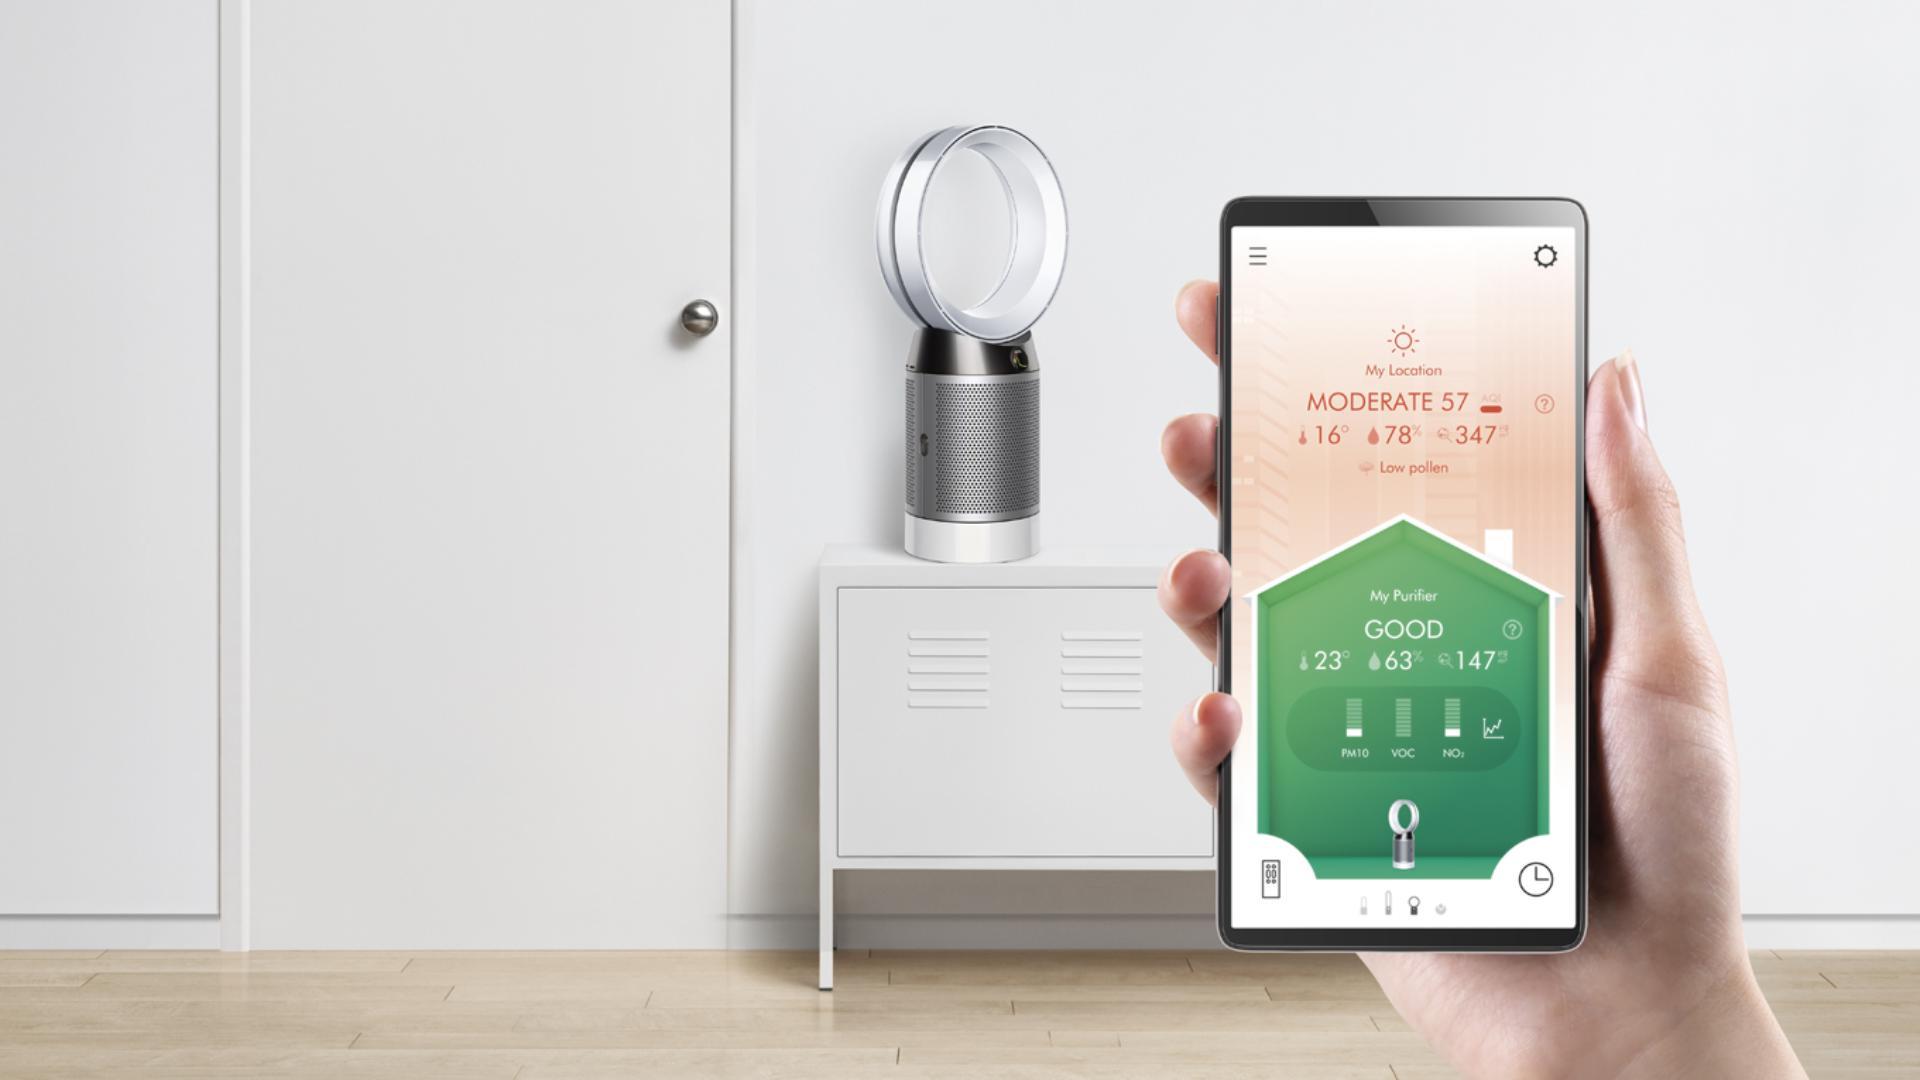 Dyson Link app on smart phone screen